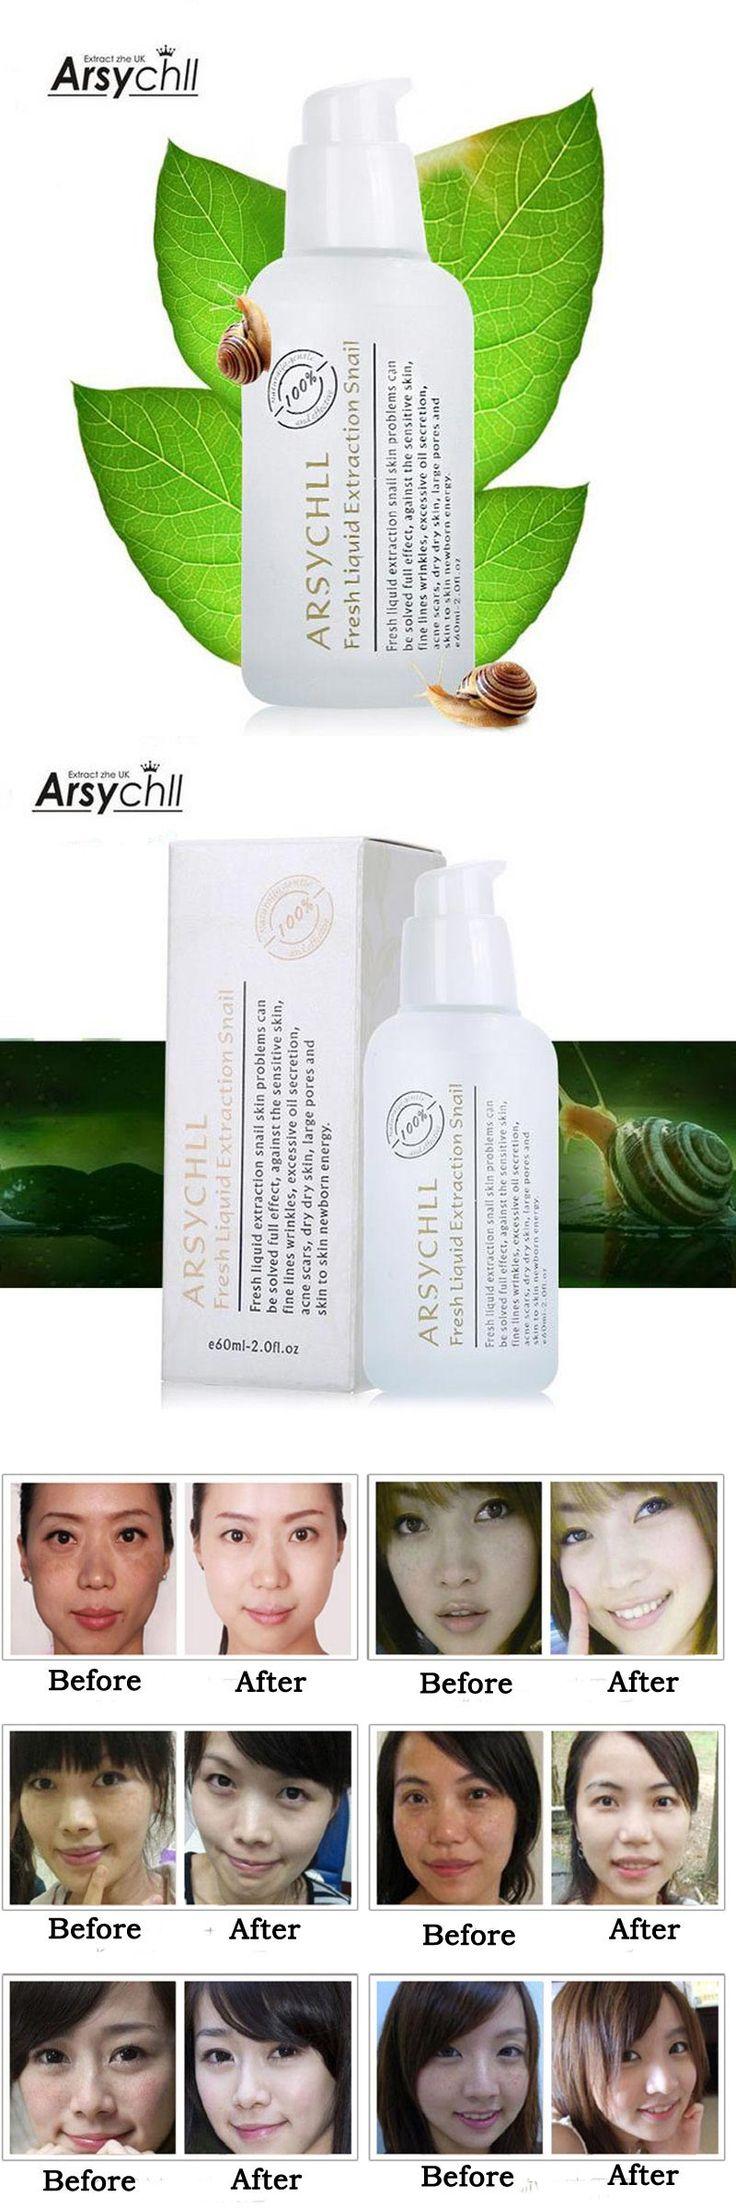 Snail Cream Korean Cosmetics Acne Treatment Whitening Moisturizing Anti Aging Wrinkle Instantly Ageless Creams Beauty Skin Care